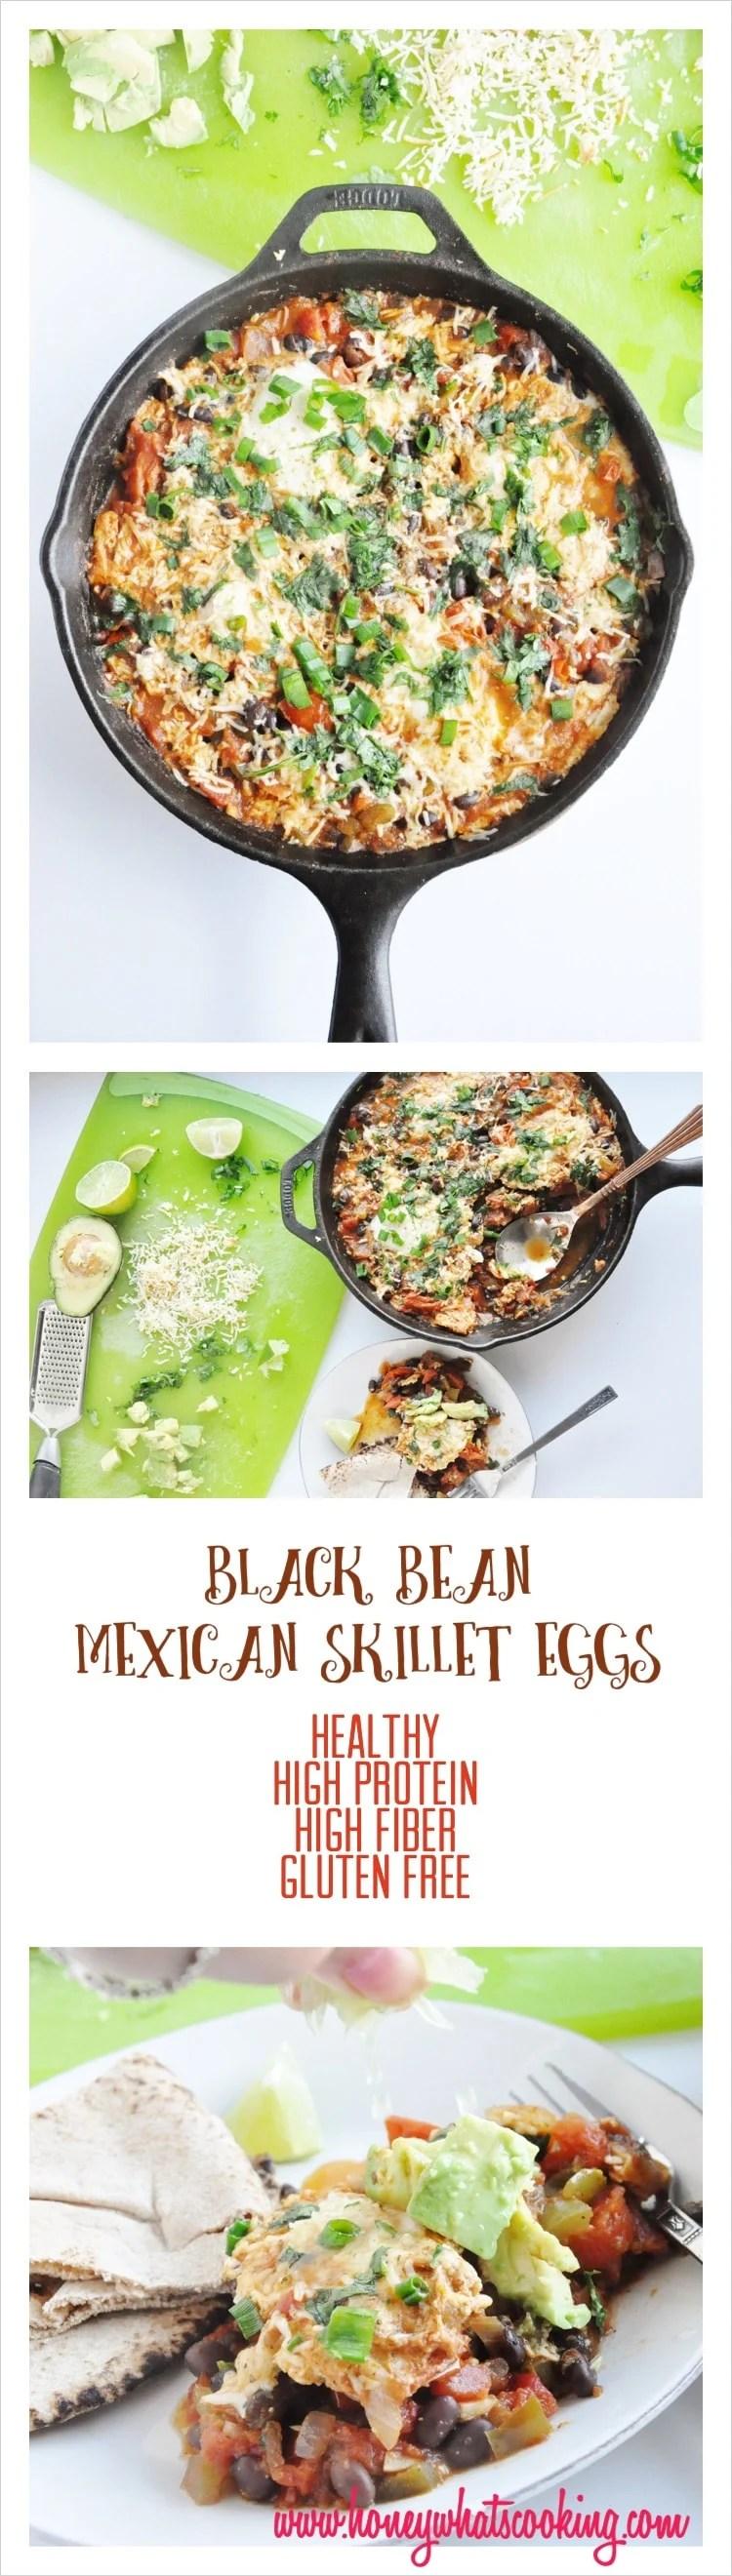 Black Bean Mexican Skillet Eggs pin